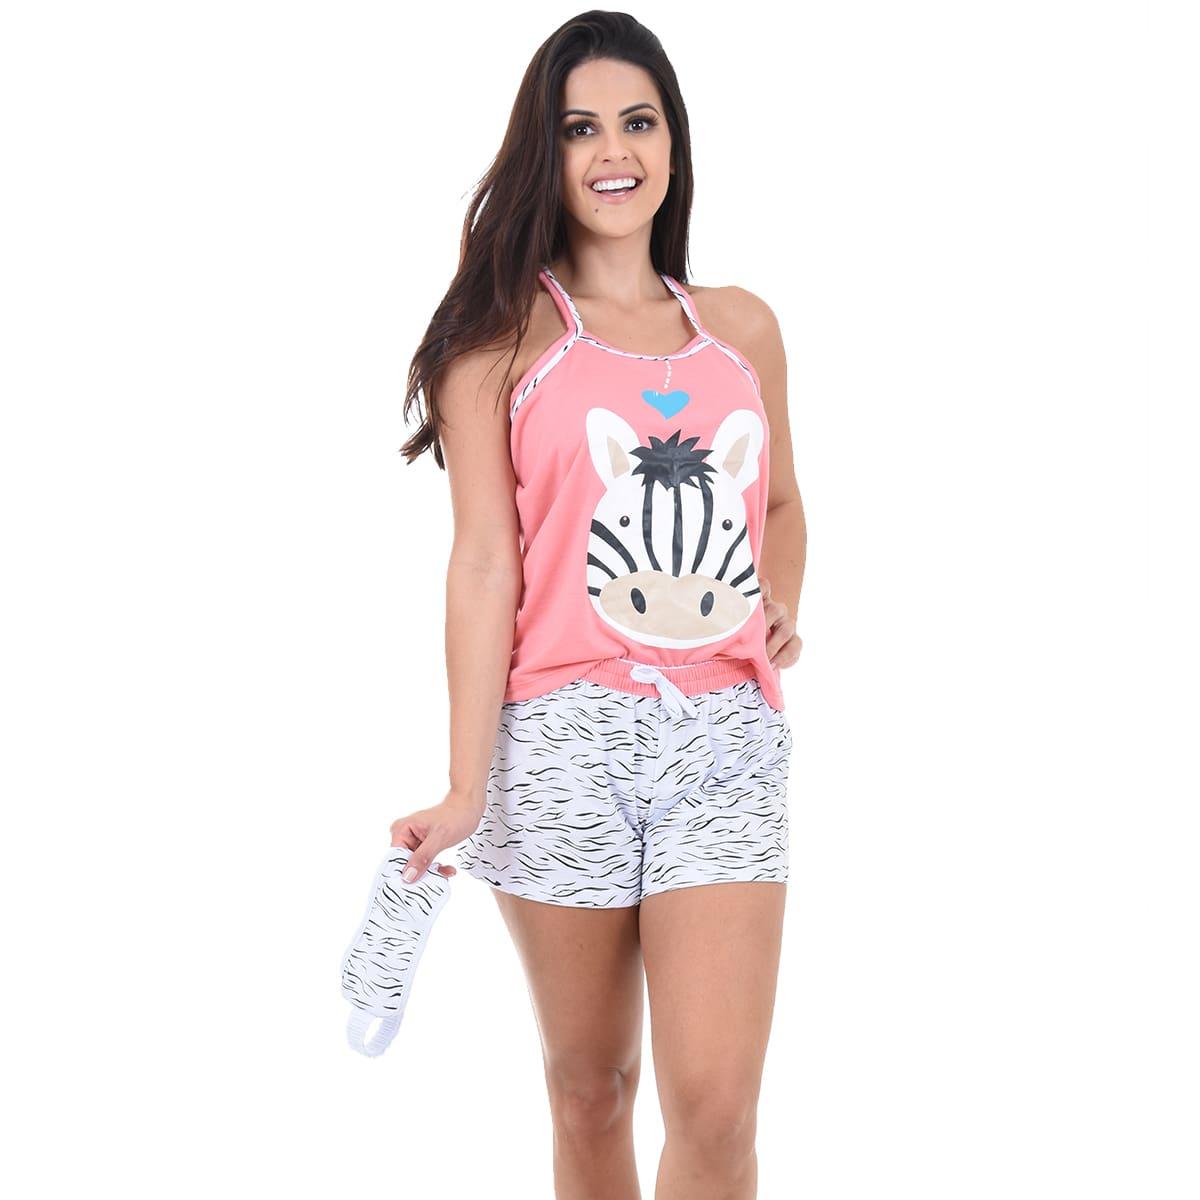 Baby Doll Short Doll Alça Feminino Adulto C/ Tapa Olho Malha Verão Ref: 296